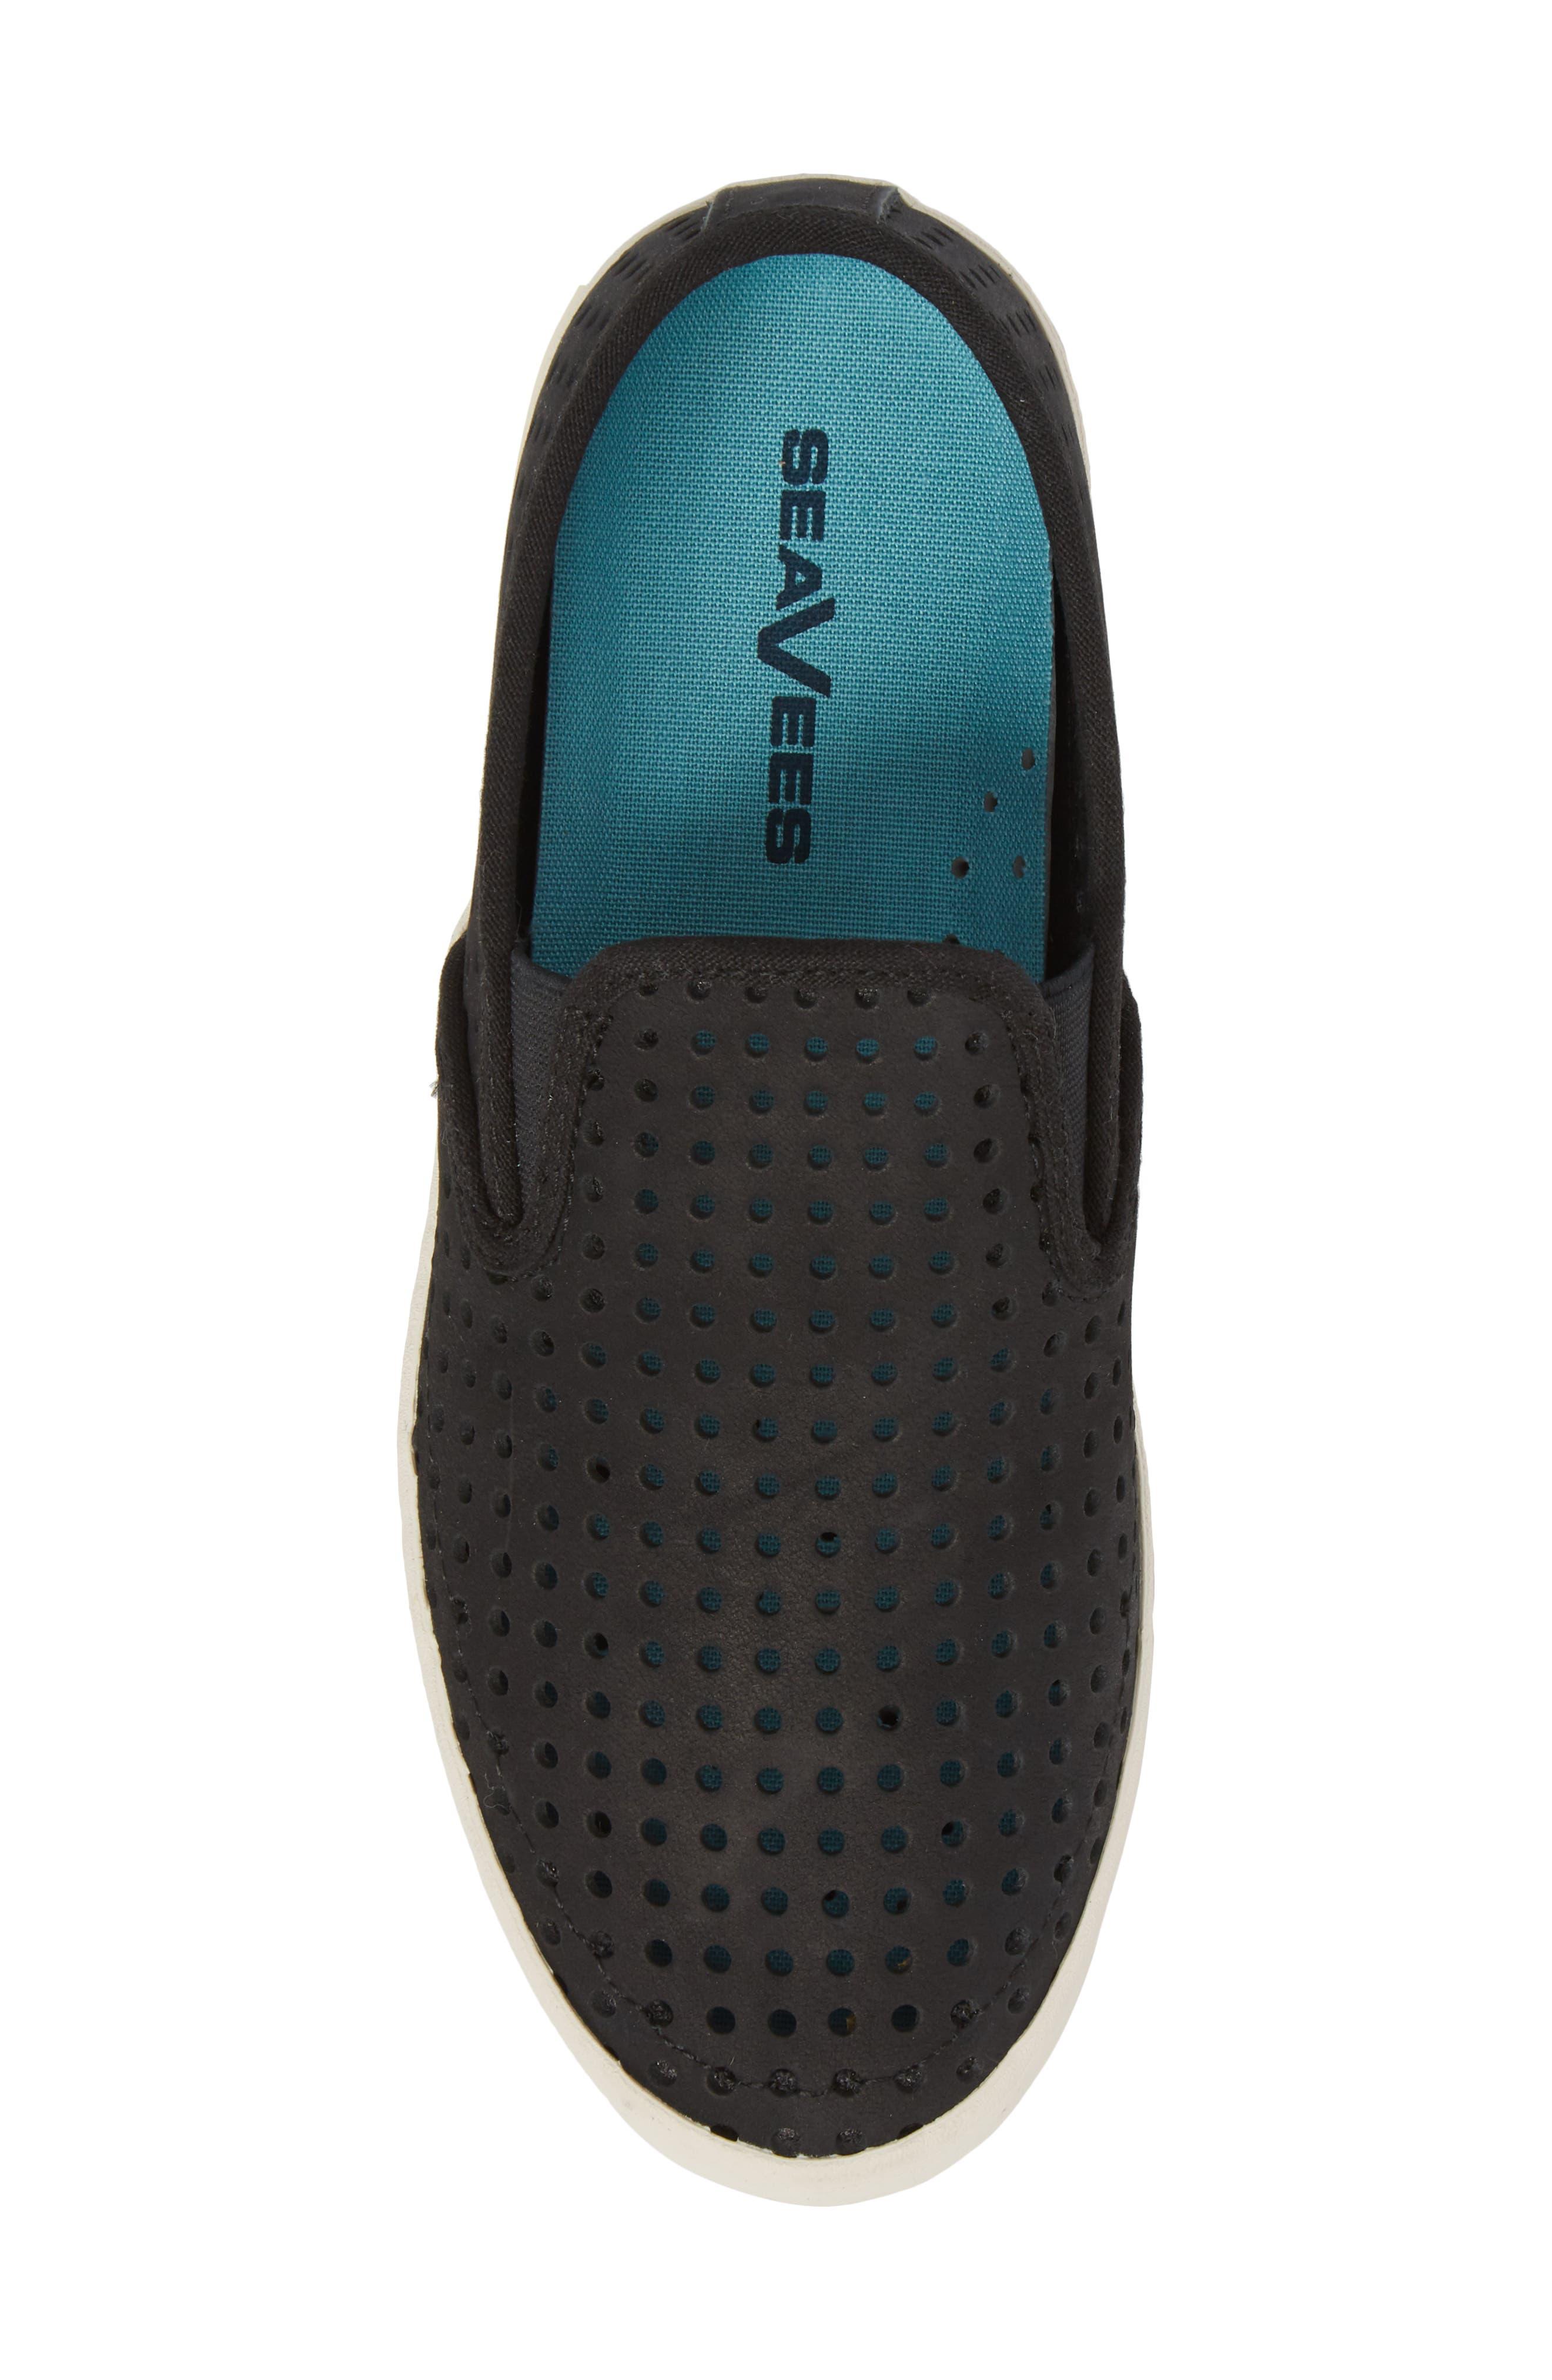 Baja Perforated Slip-On Sneaker,                             Alternate thumbnail 5, color,                             BLACK